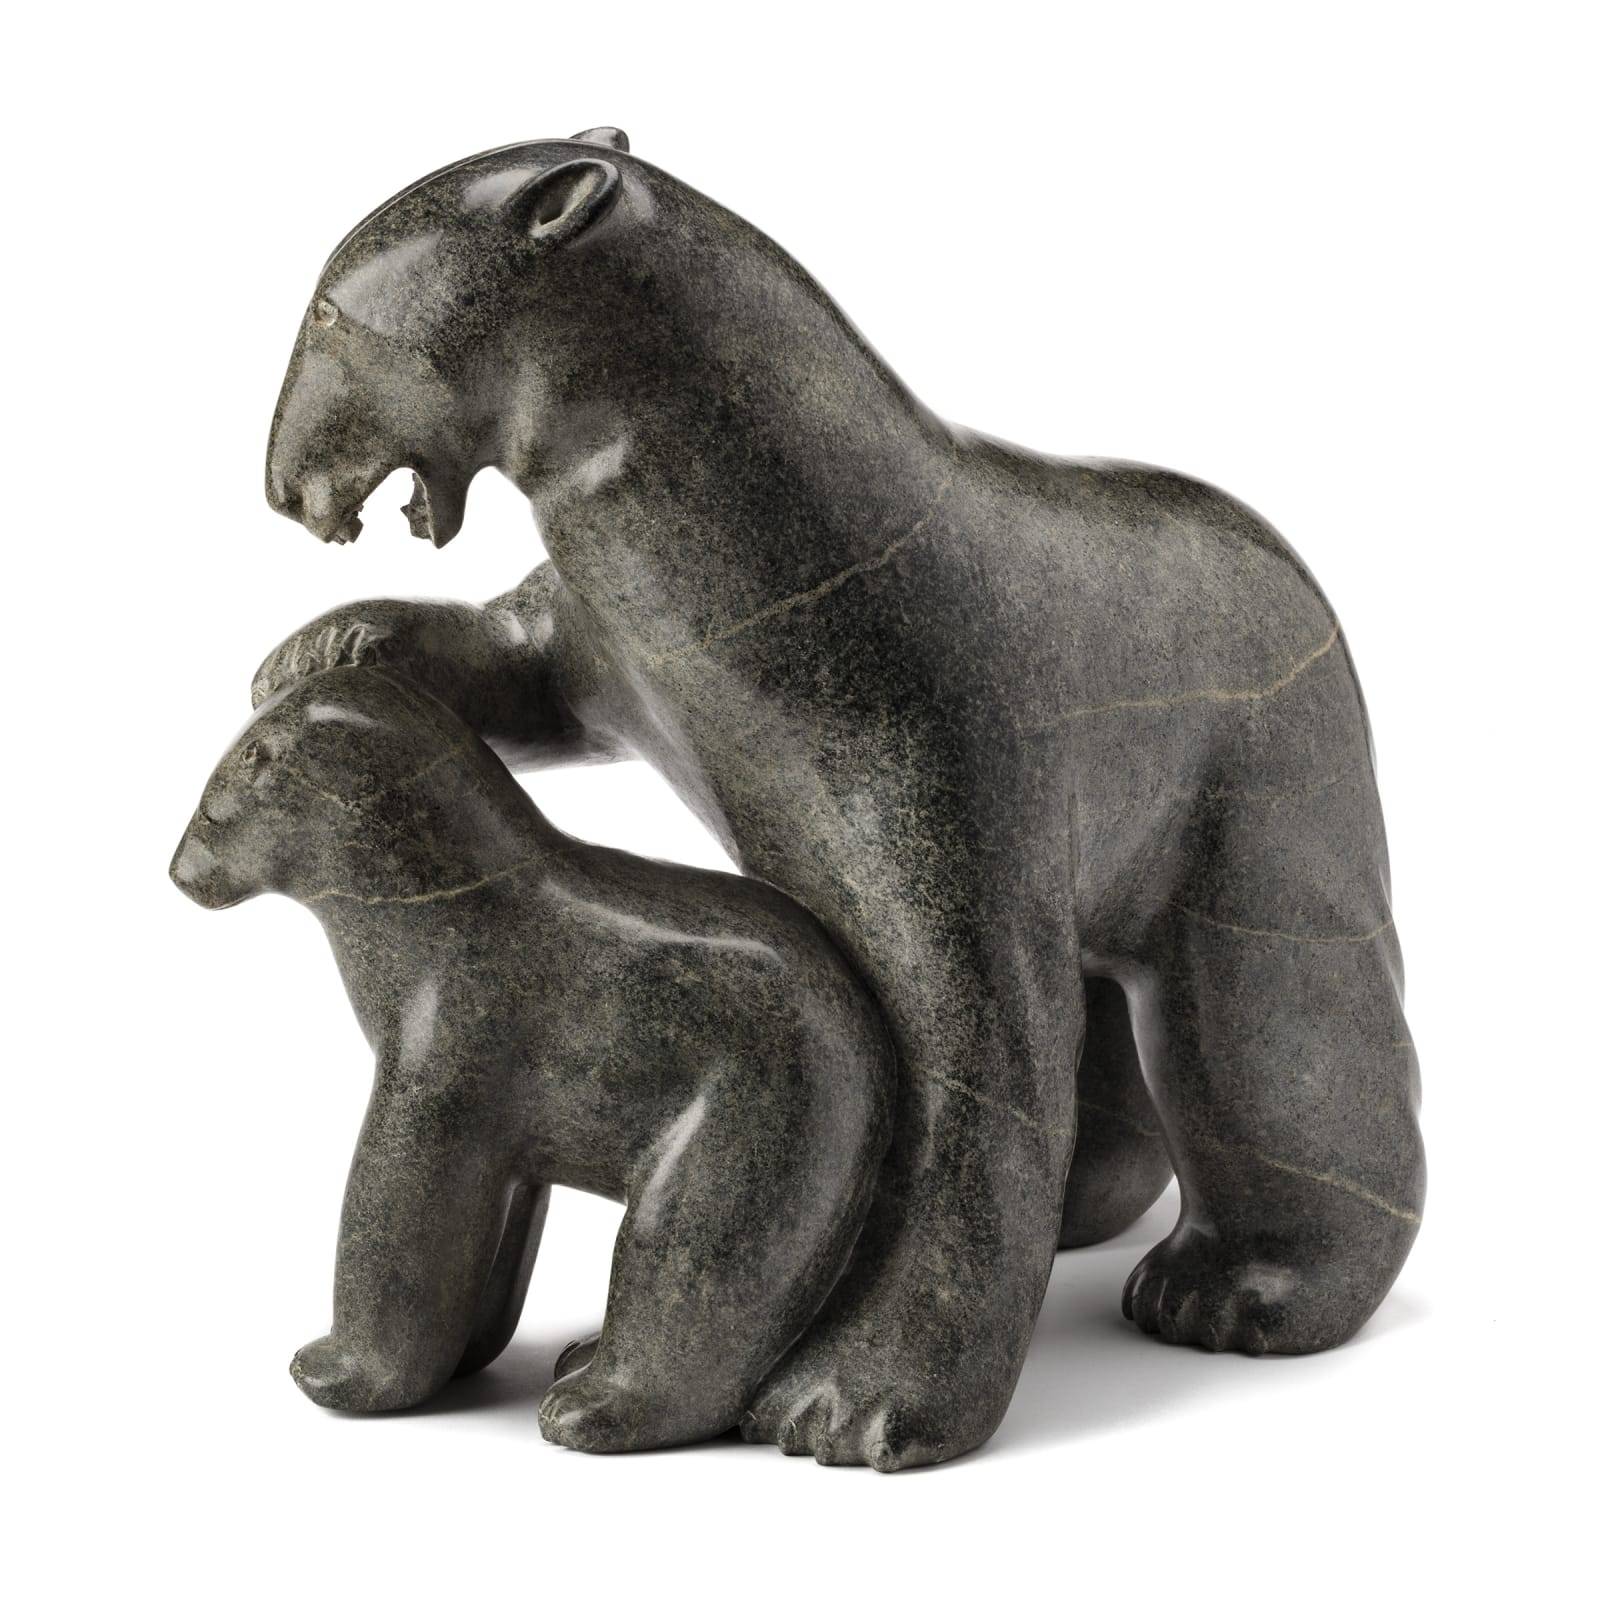 NUTARALUK UILIA IYAITUK (1943-) IVUJIVIK Polar Bear and Cub, c. 1980s REALIZED: $8,400